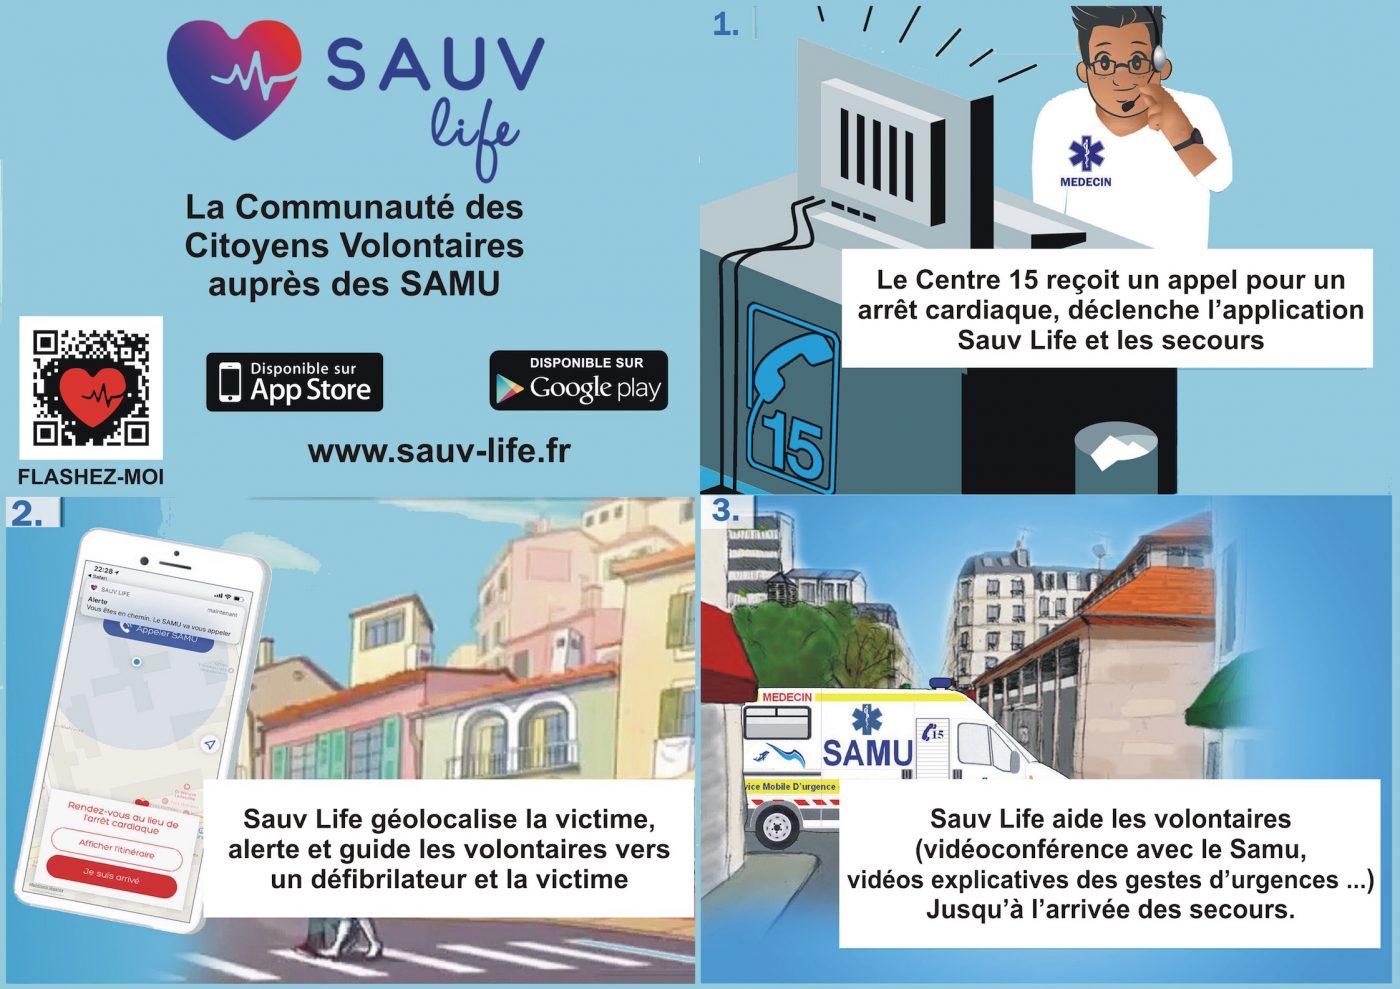 groupe-bsl-securite-agence-securite-ile-de-france-infographie-sauvlife